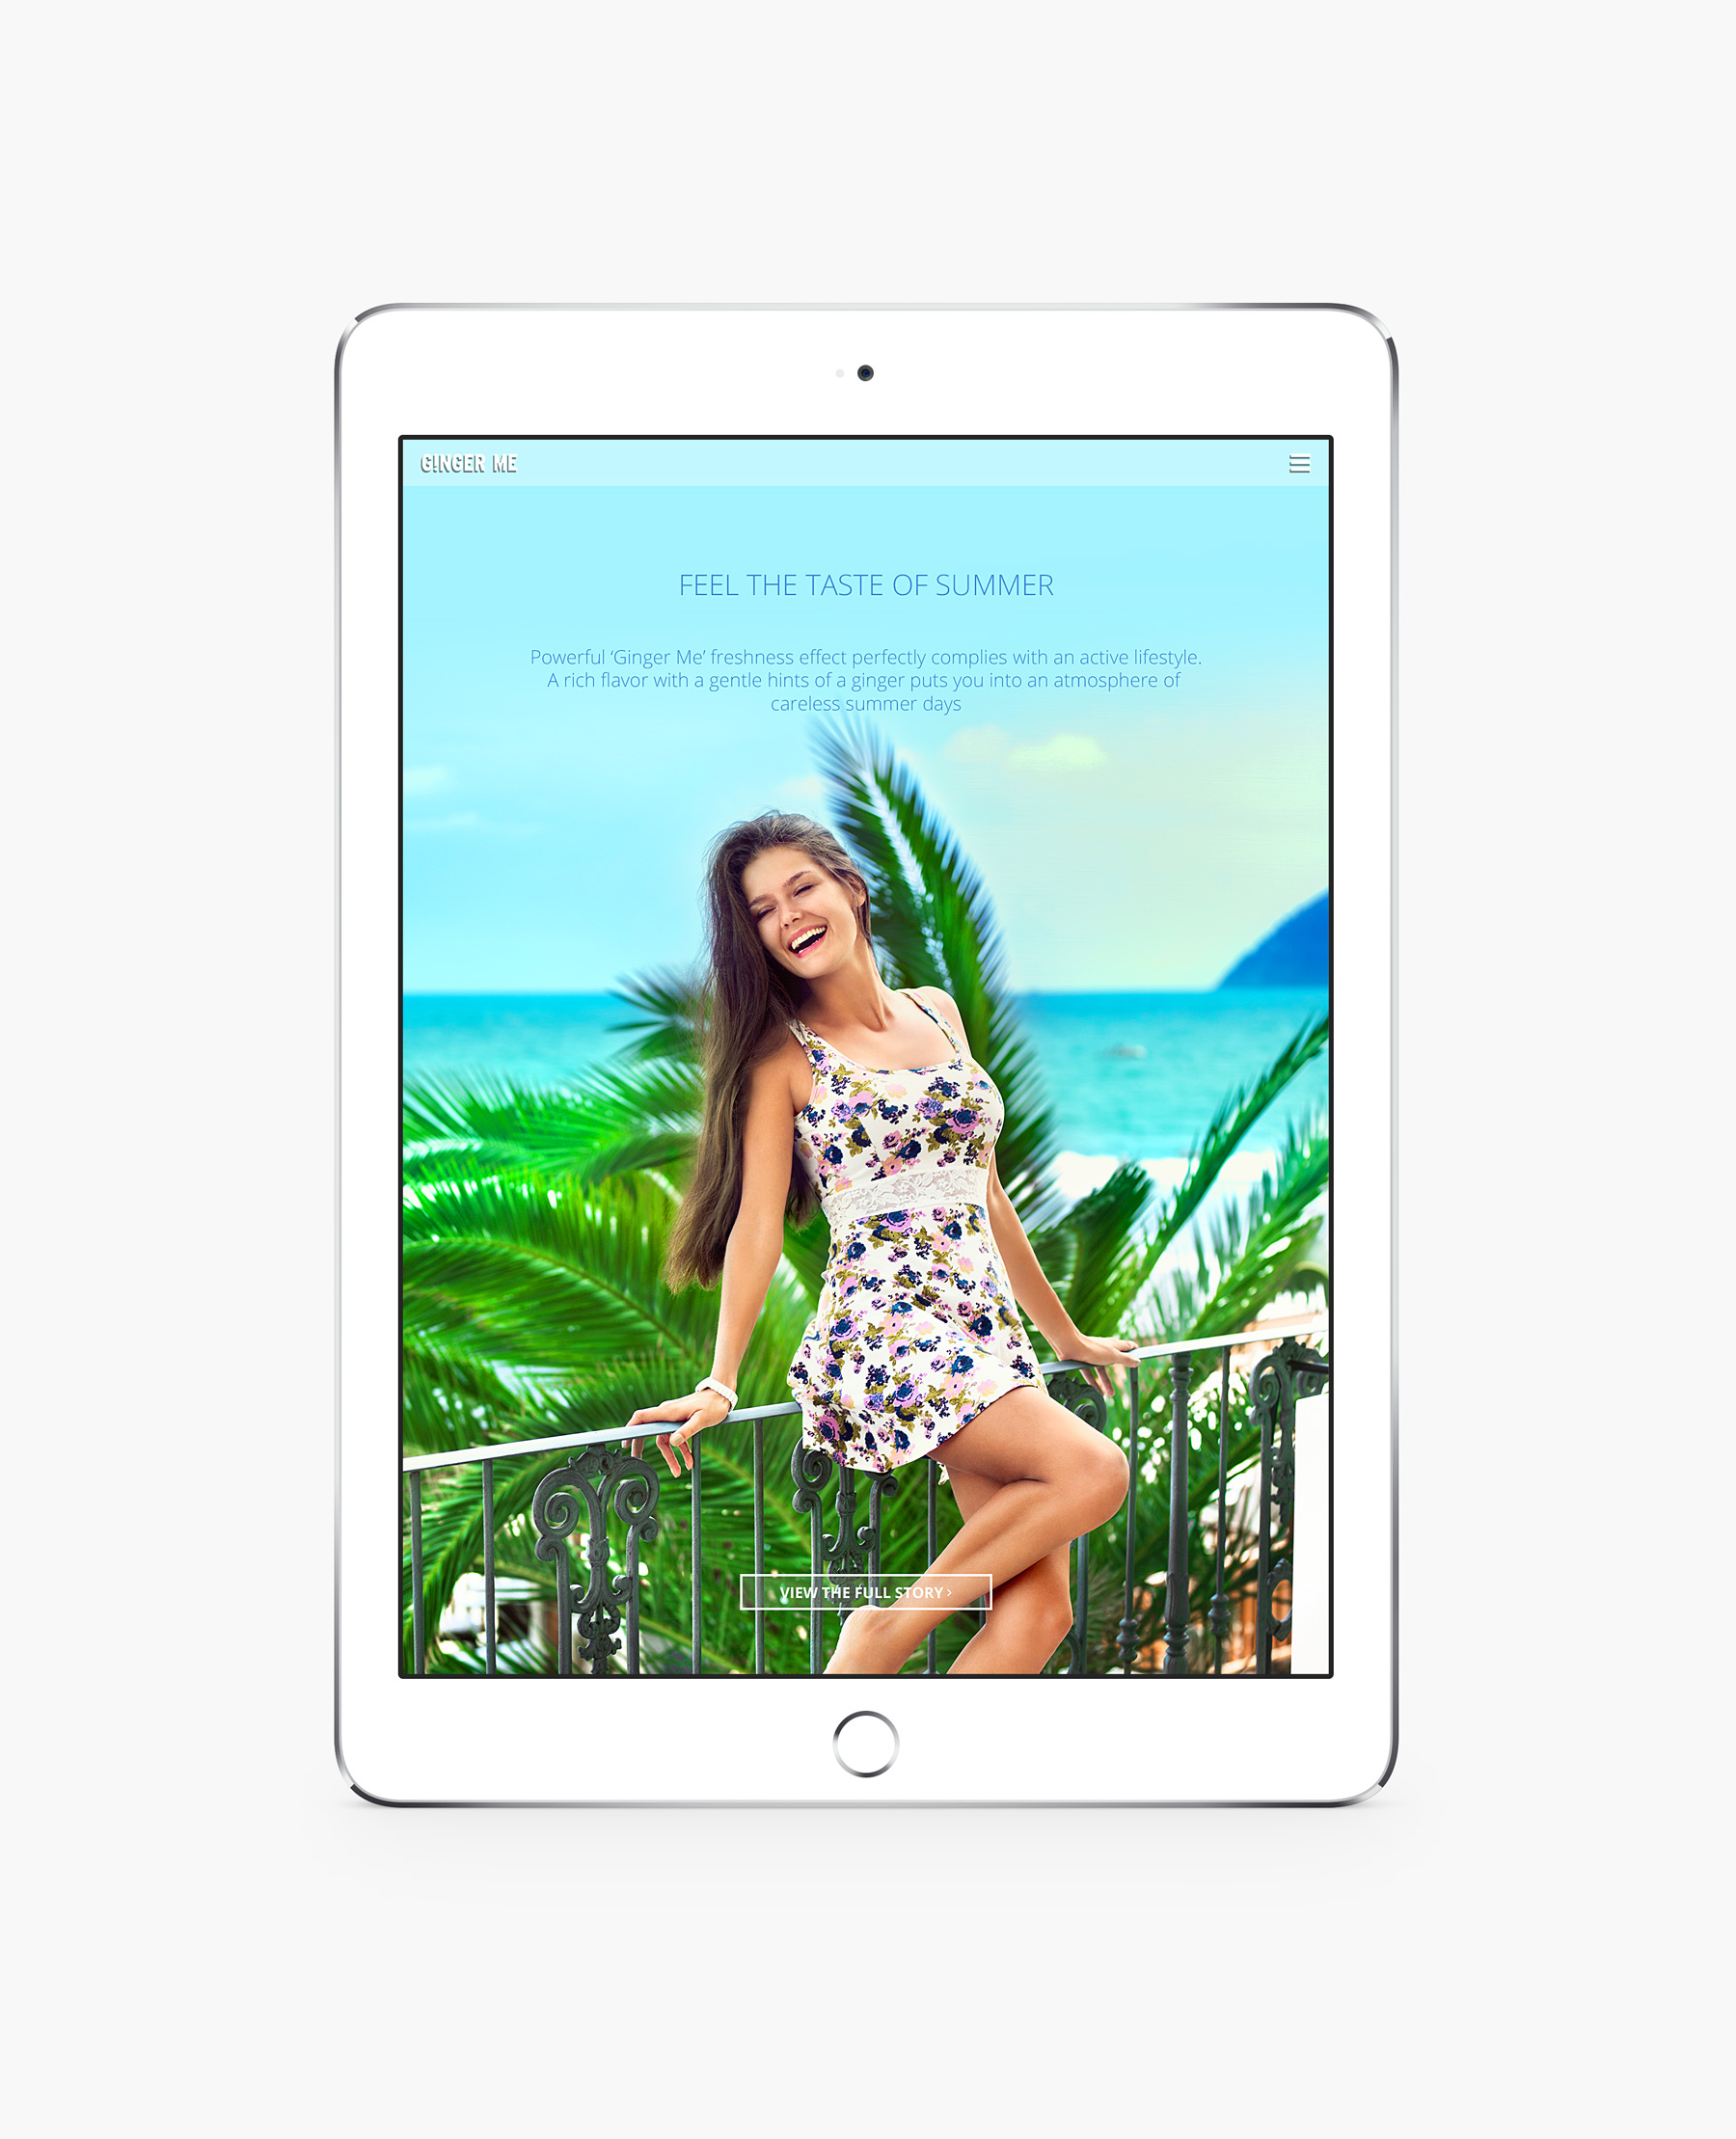 Ginger Me website presentation - Beach story cover